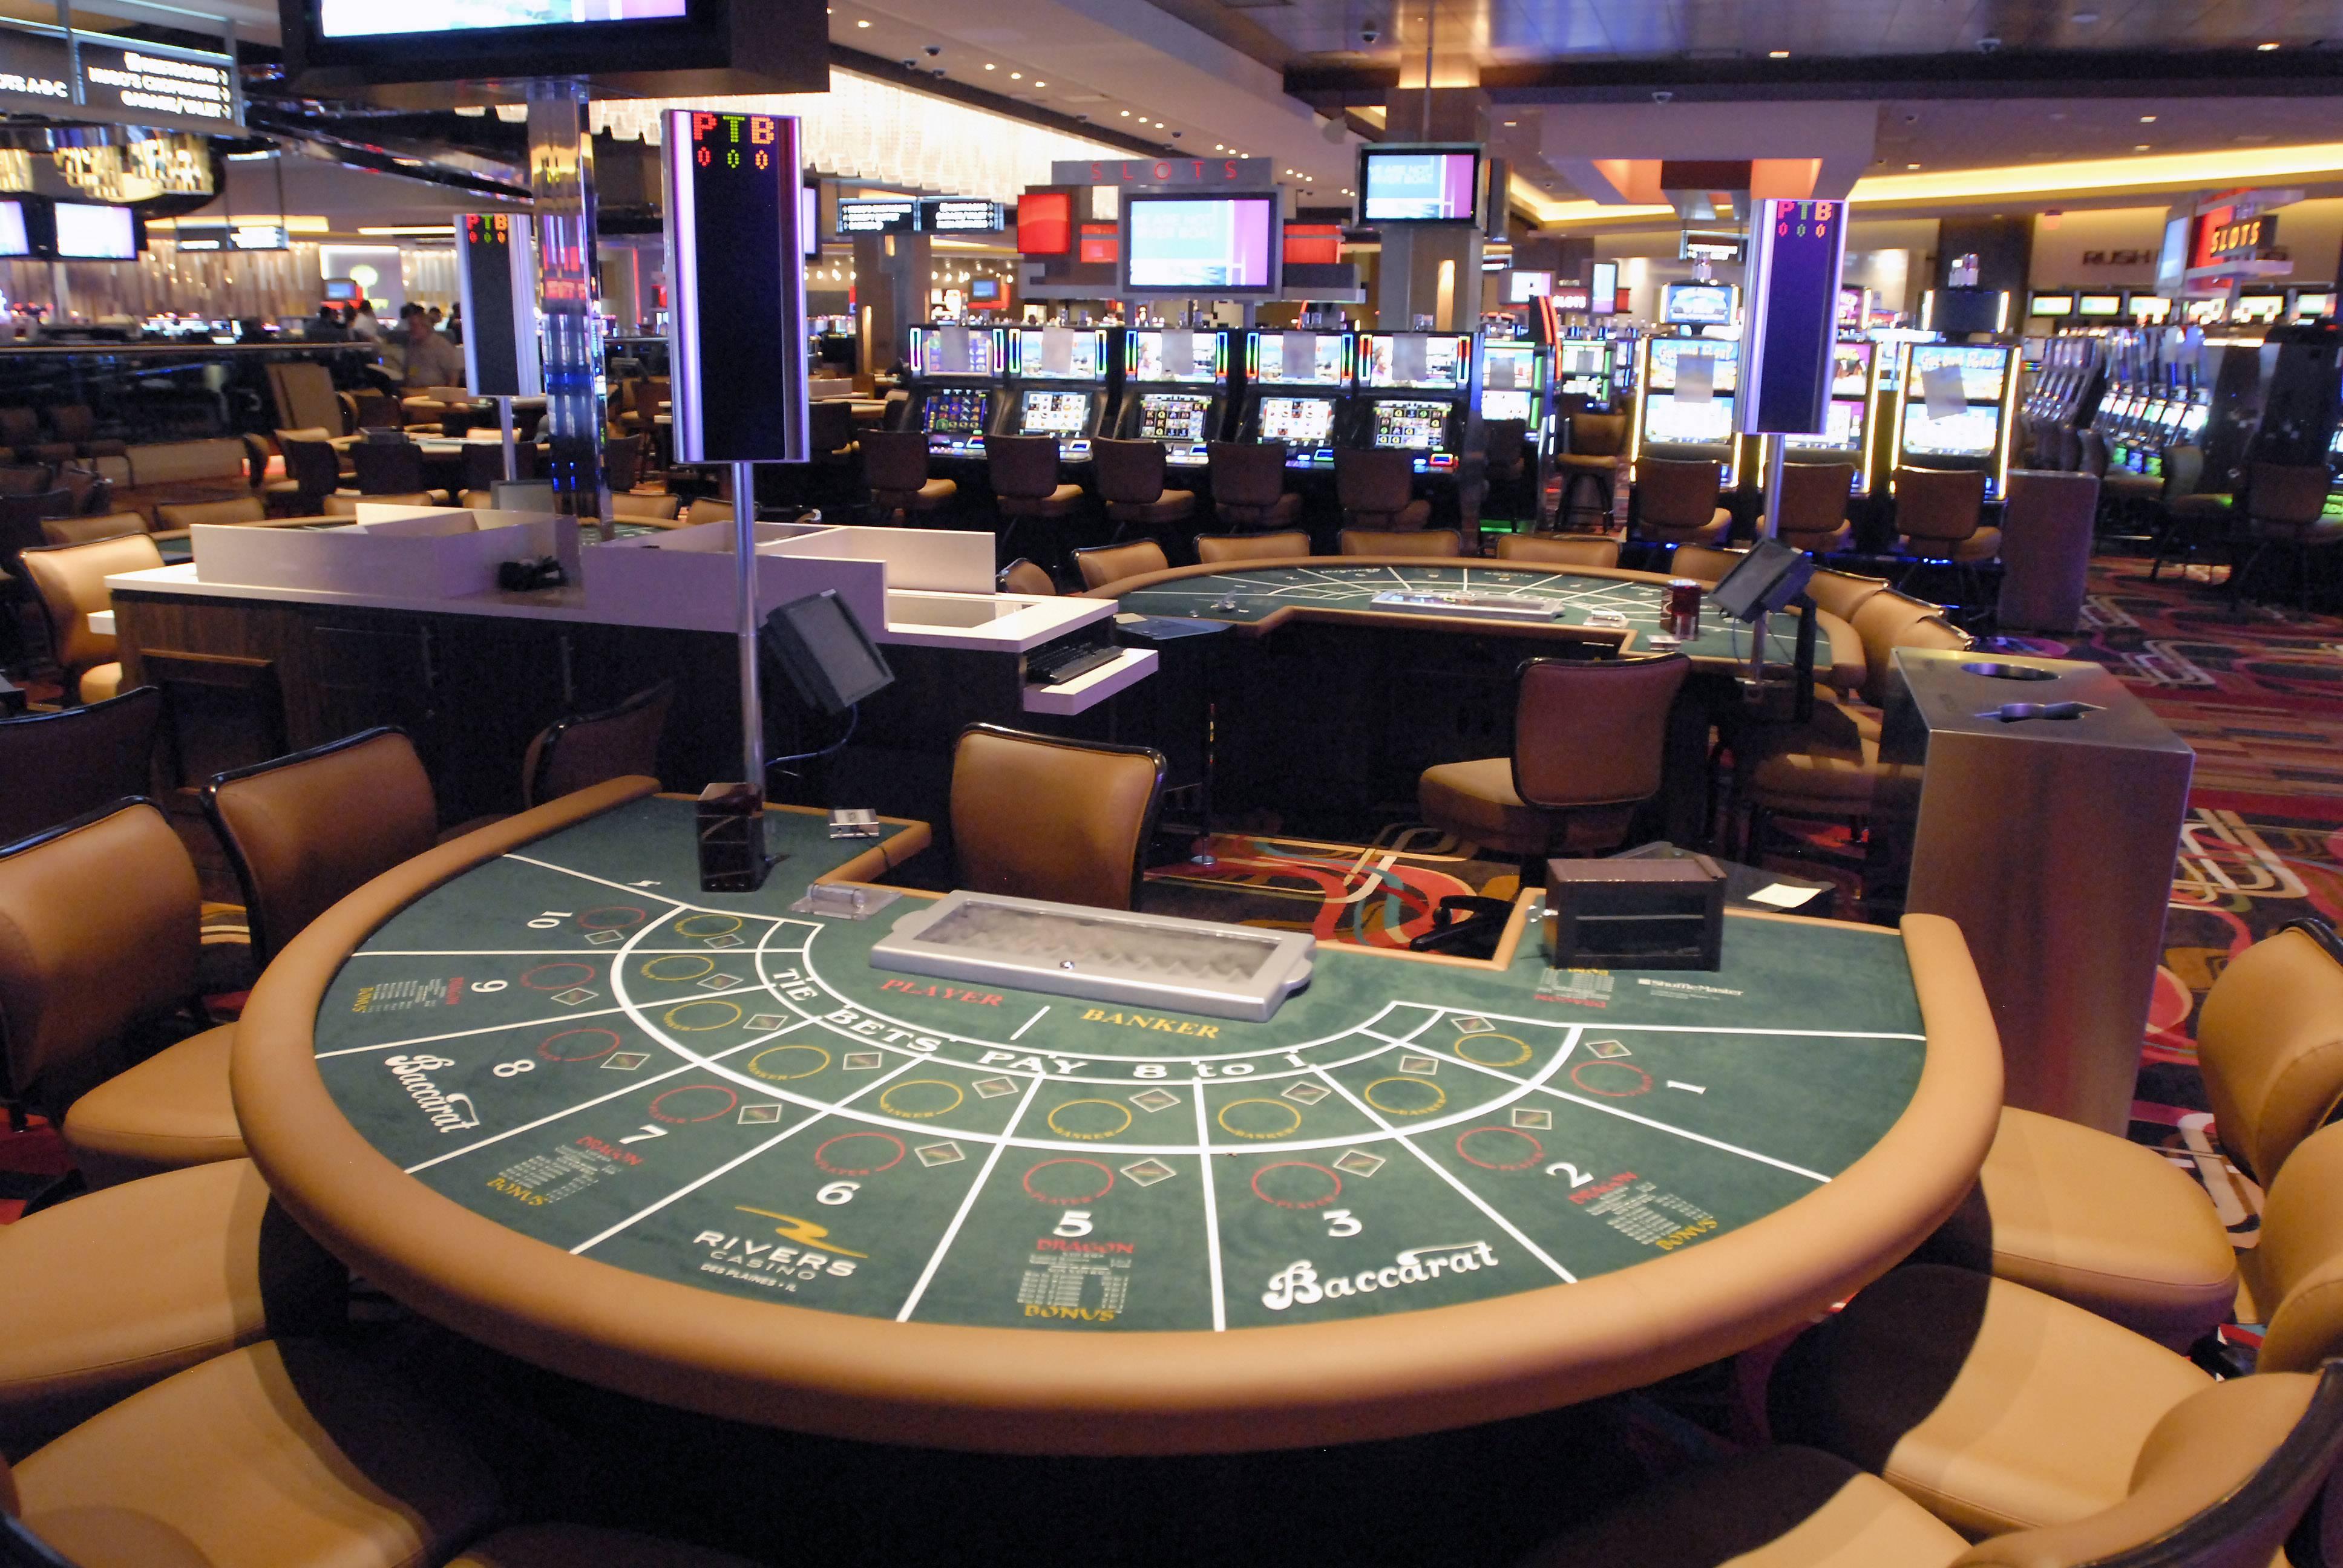 Gambling in chicago forclosures gambling